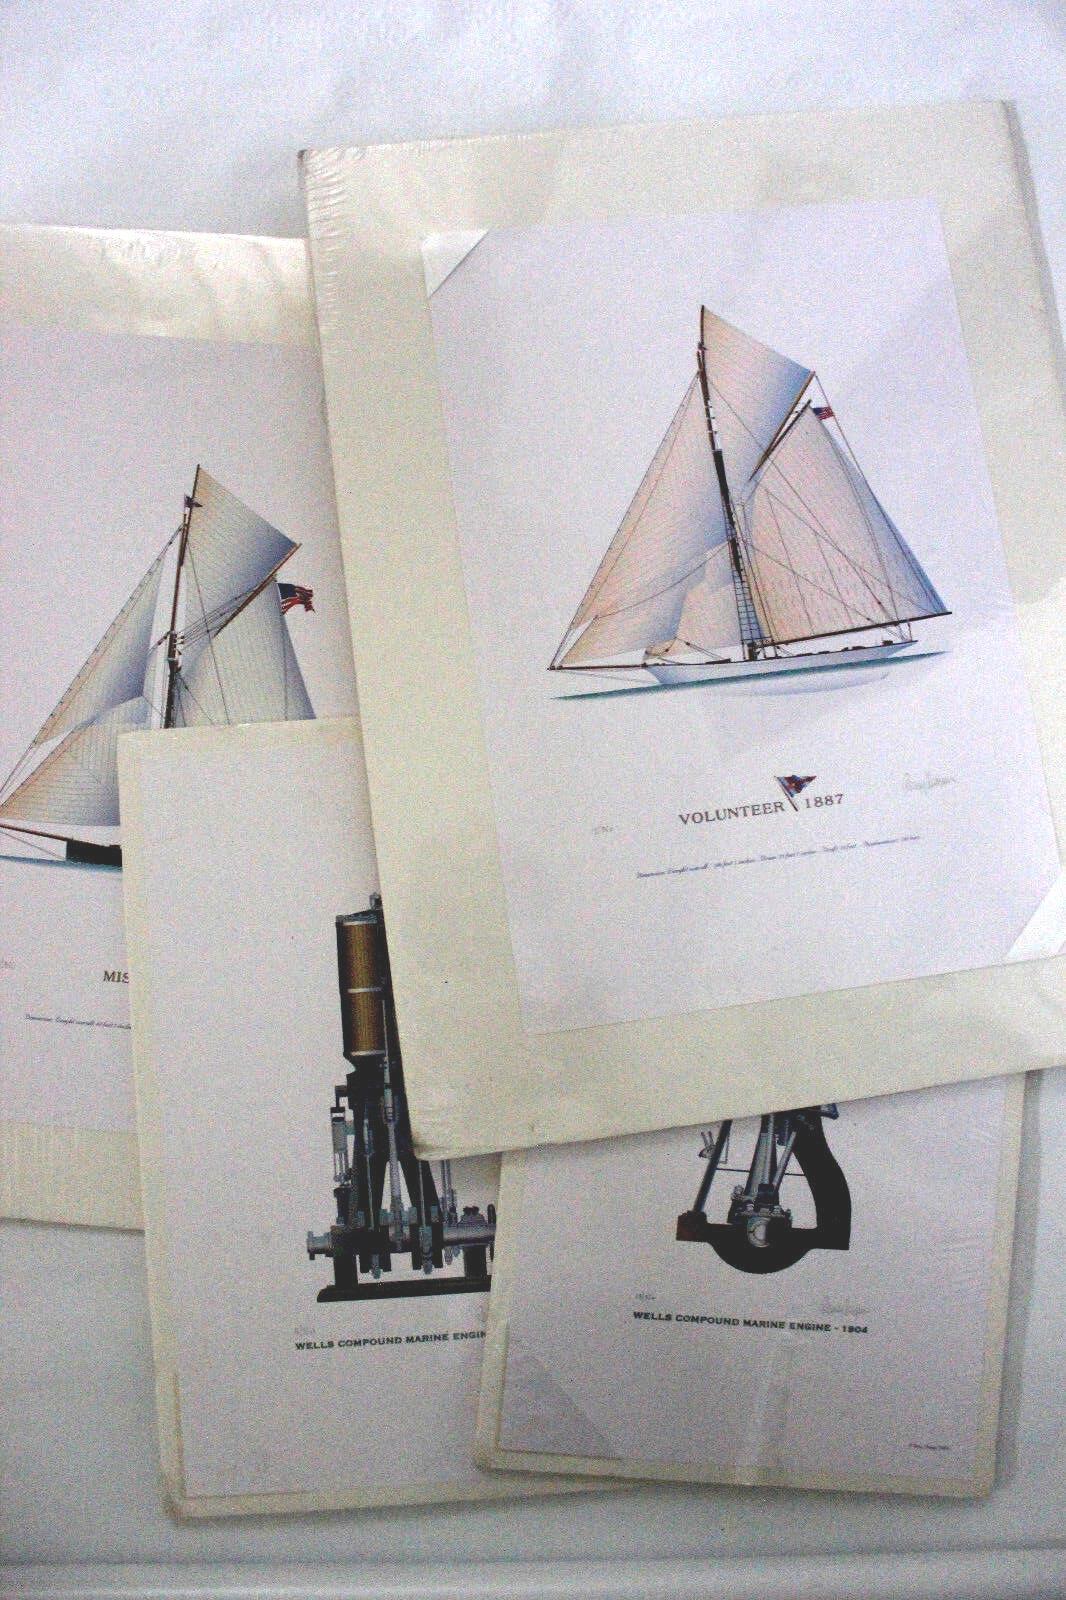 America Cup Nautical Lithograph Art Sailing Ship Remy Champt Original Signed  - $45.00